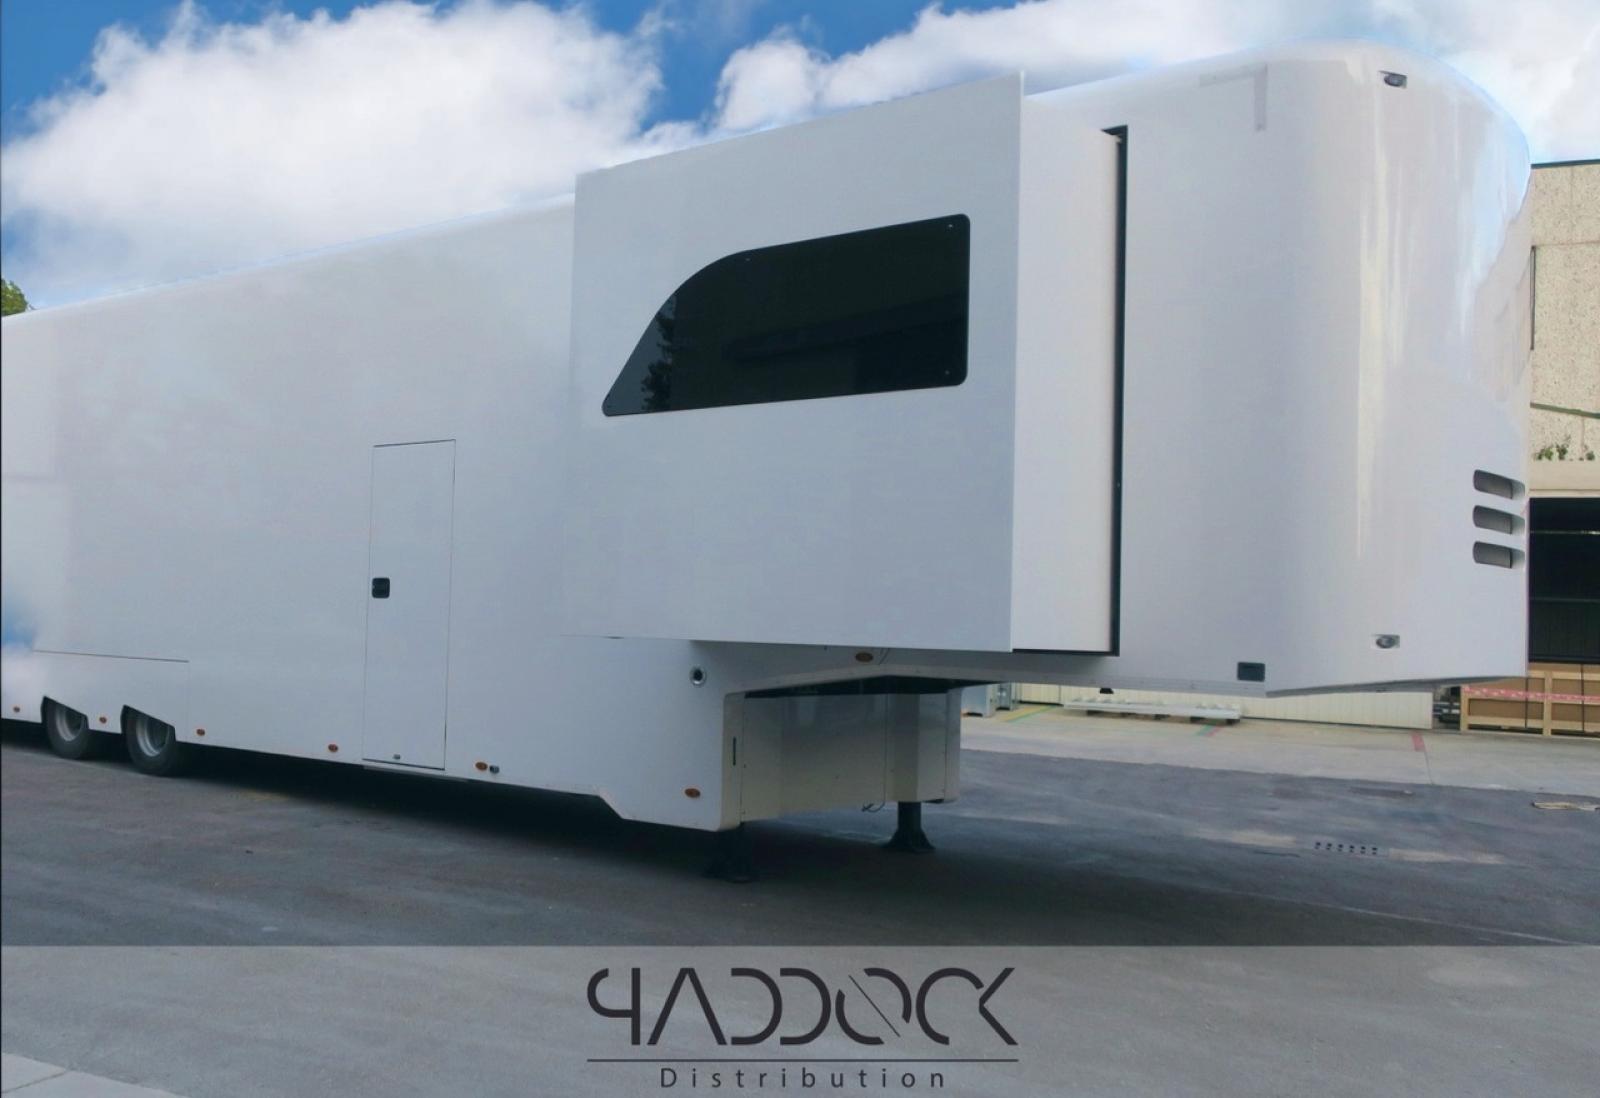 Z3 SLIDE ASTA CAR BY PADDOCK DISTRIBUTION - 1